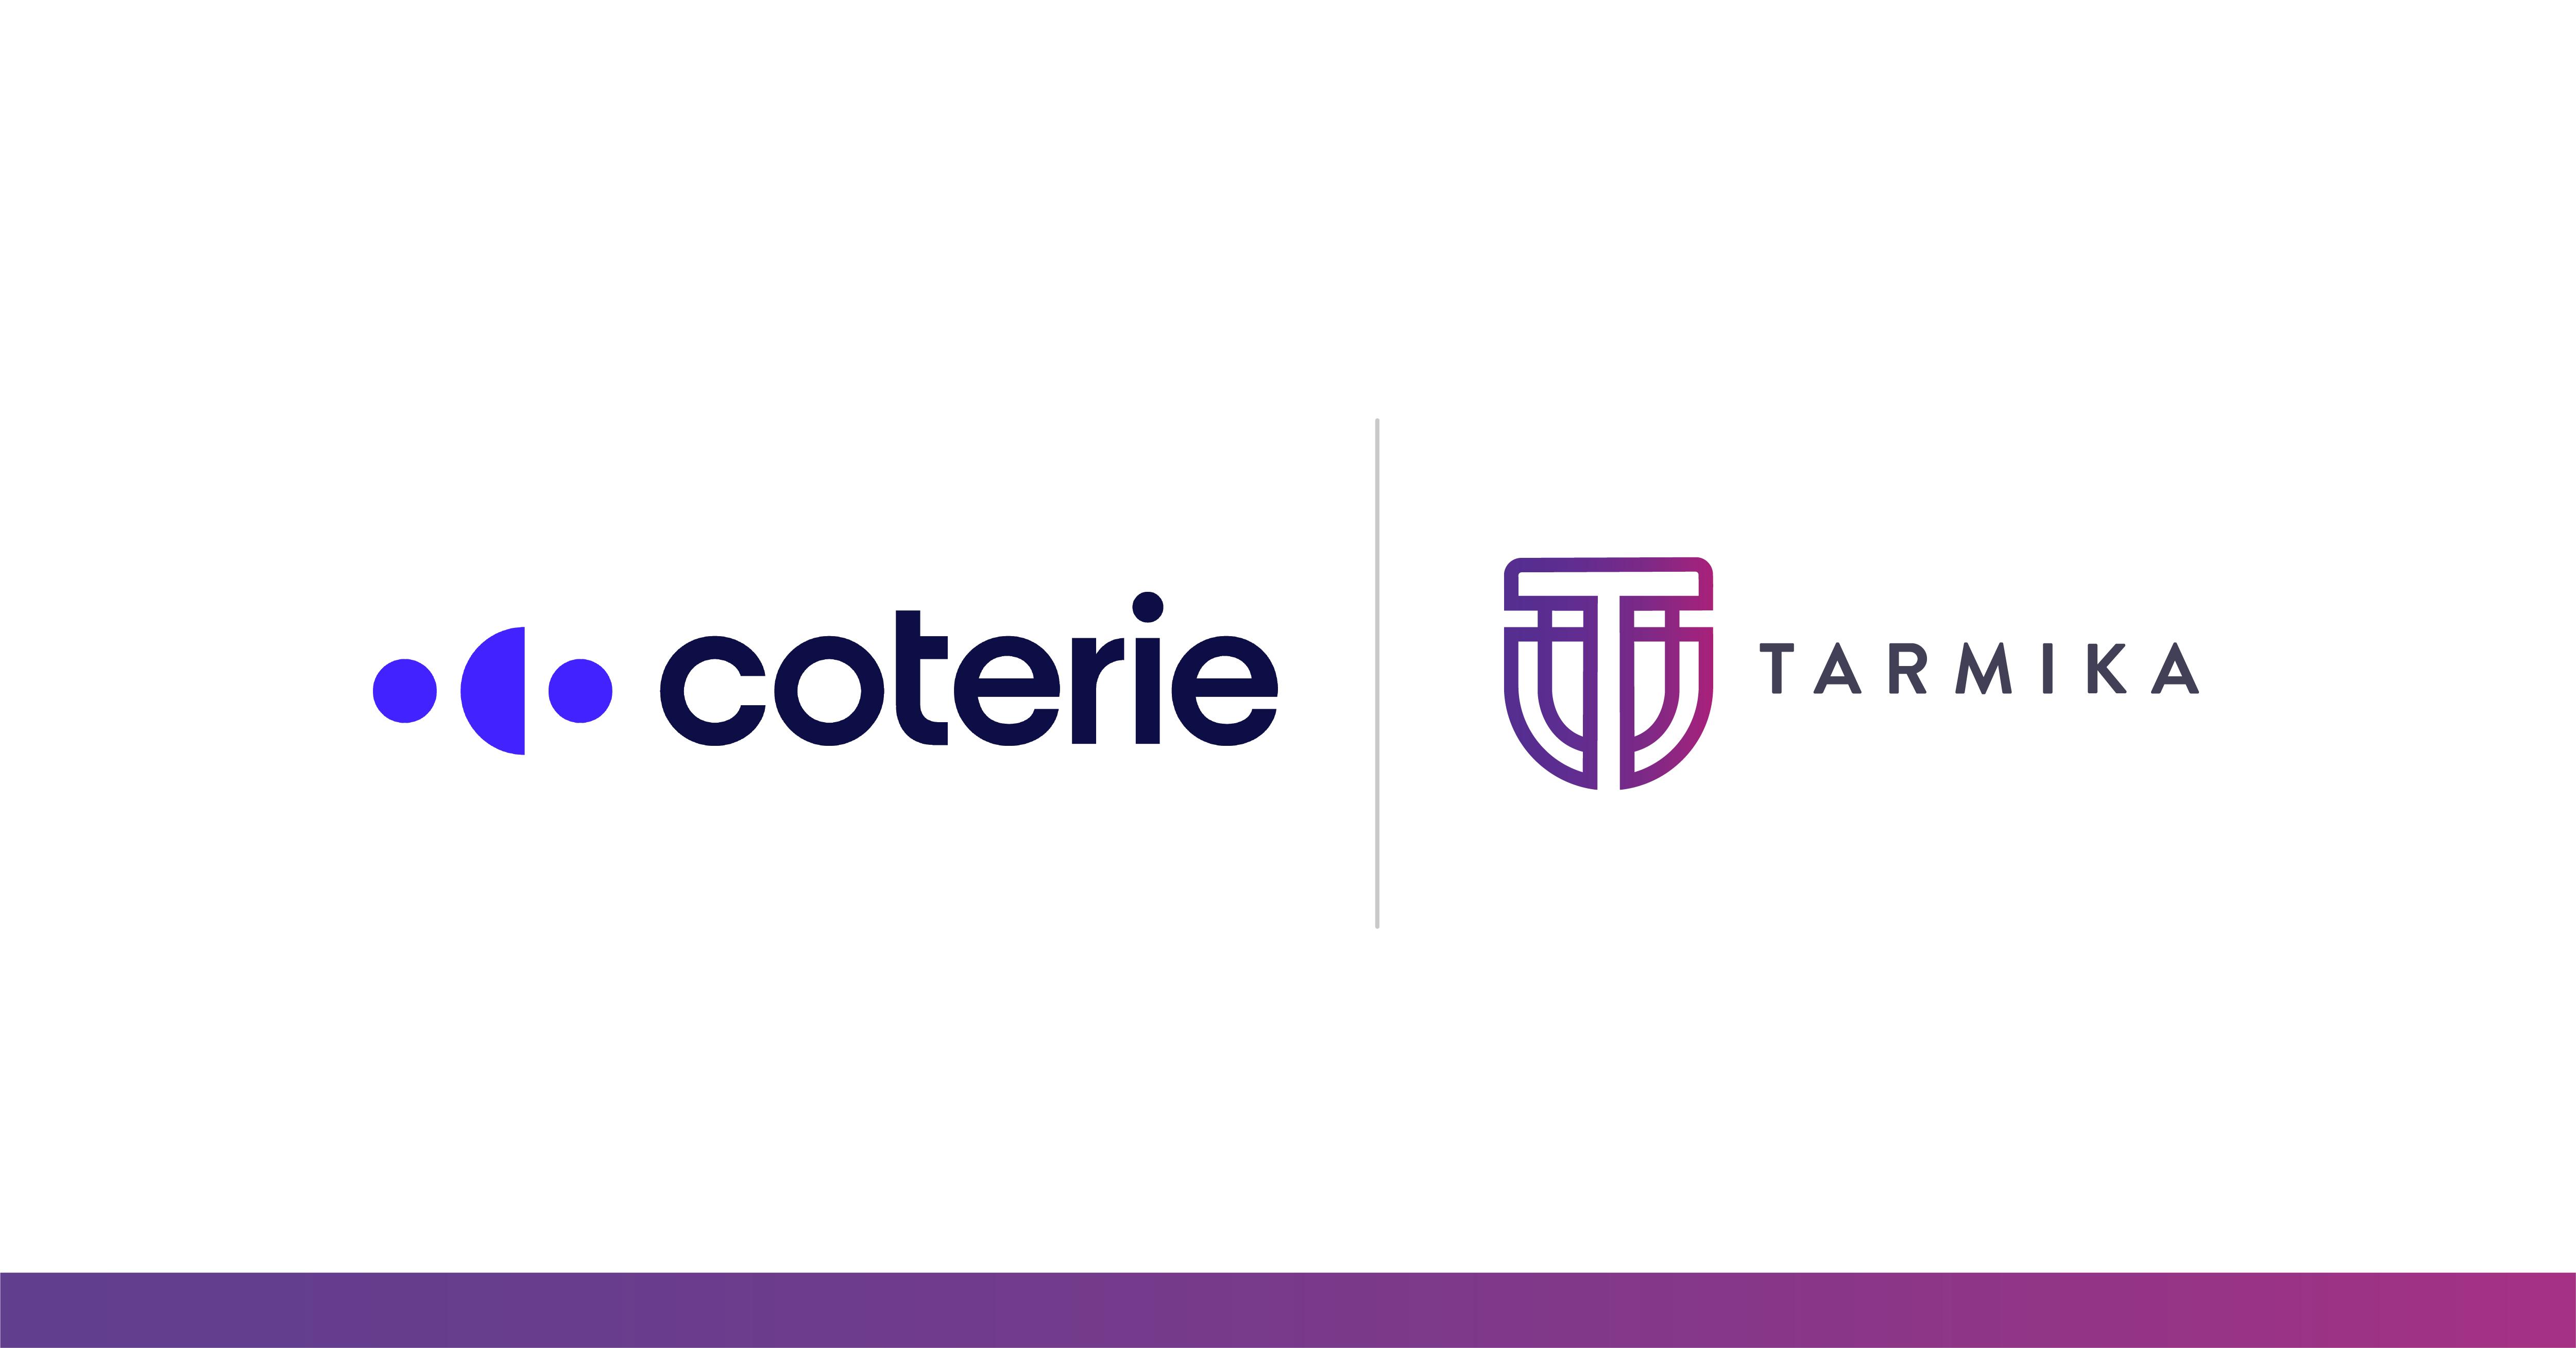 Tarmika New Partnership with Coterie